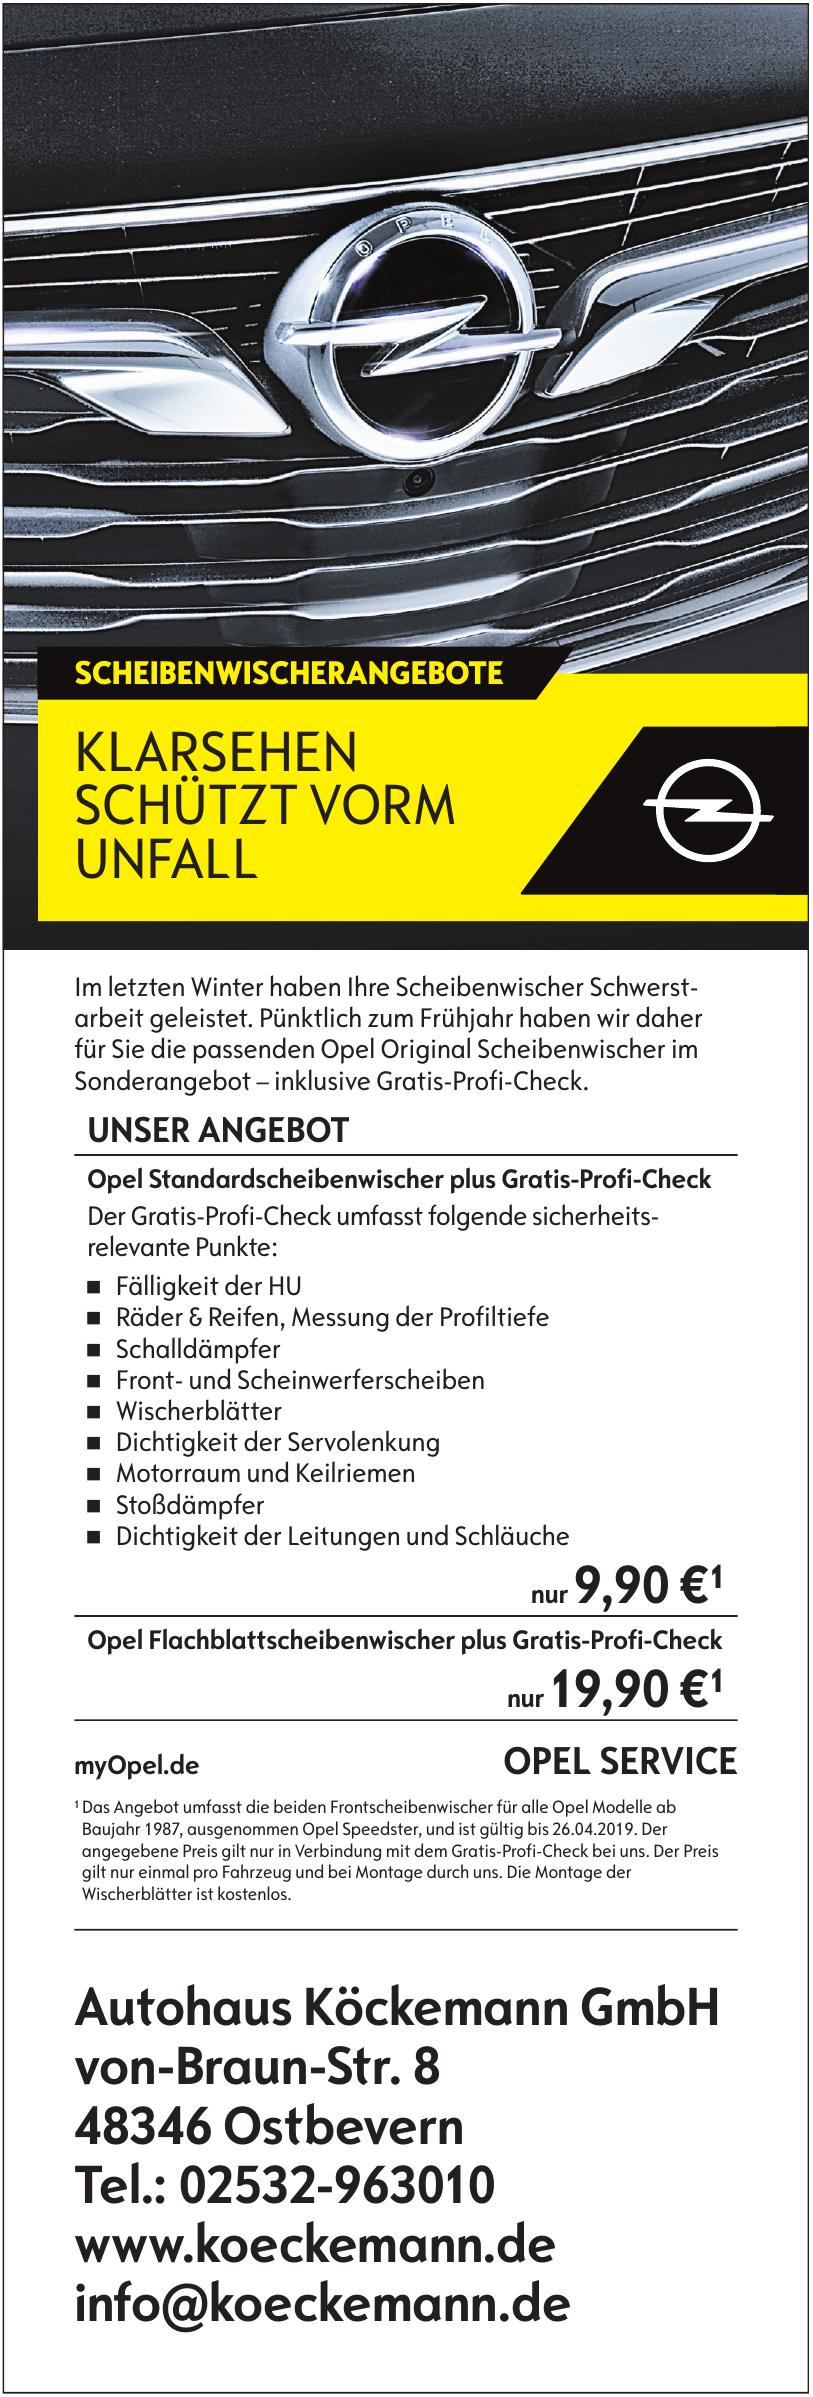 Autohaus Köckemann GmbH